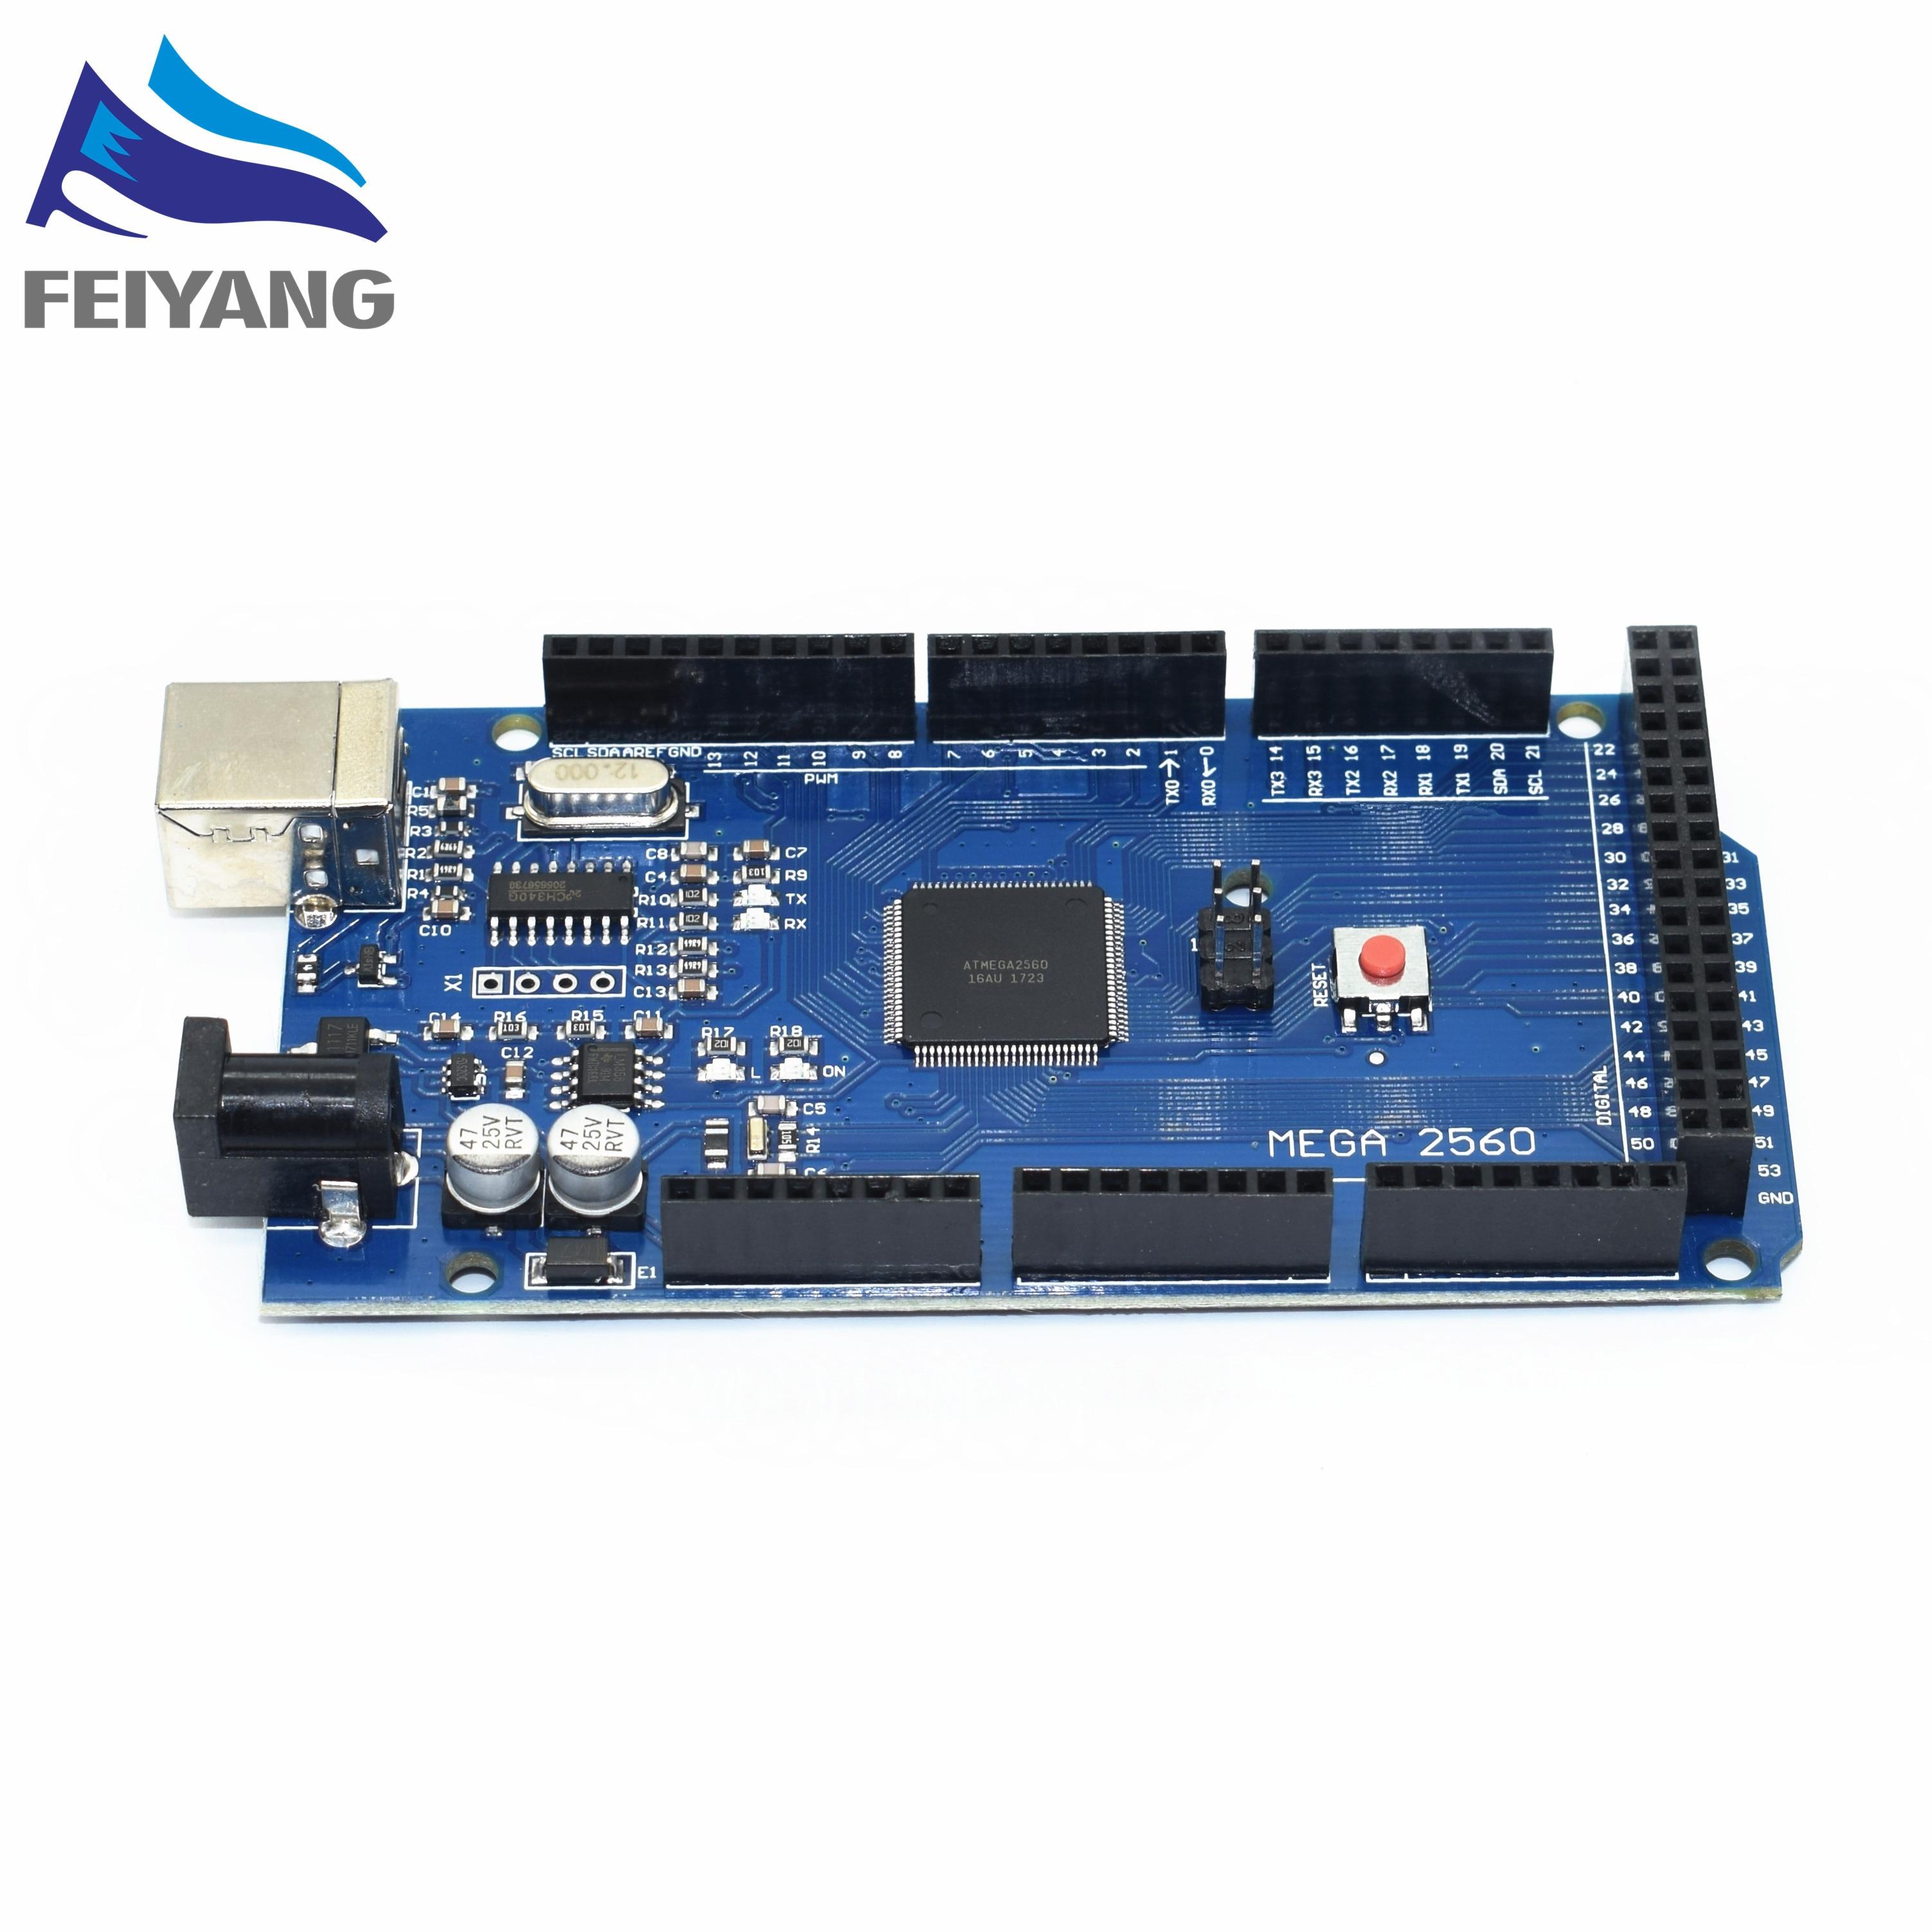 10 PCS SAMIORE ROBOT MEGA2560 MEGA 2560 R3 (ATmega2560-16AU CH340G) AVR USB conseil